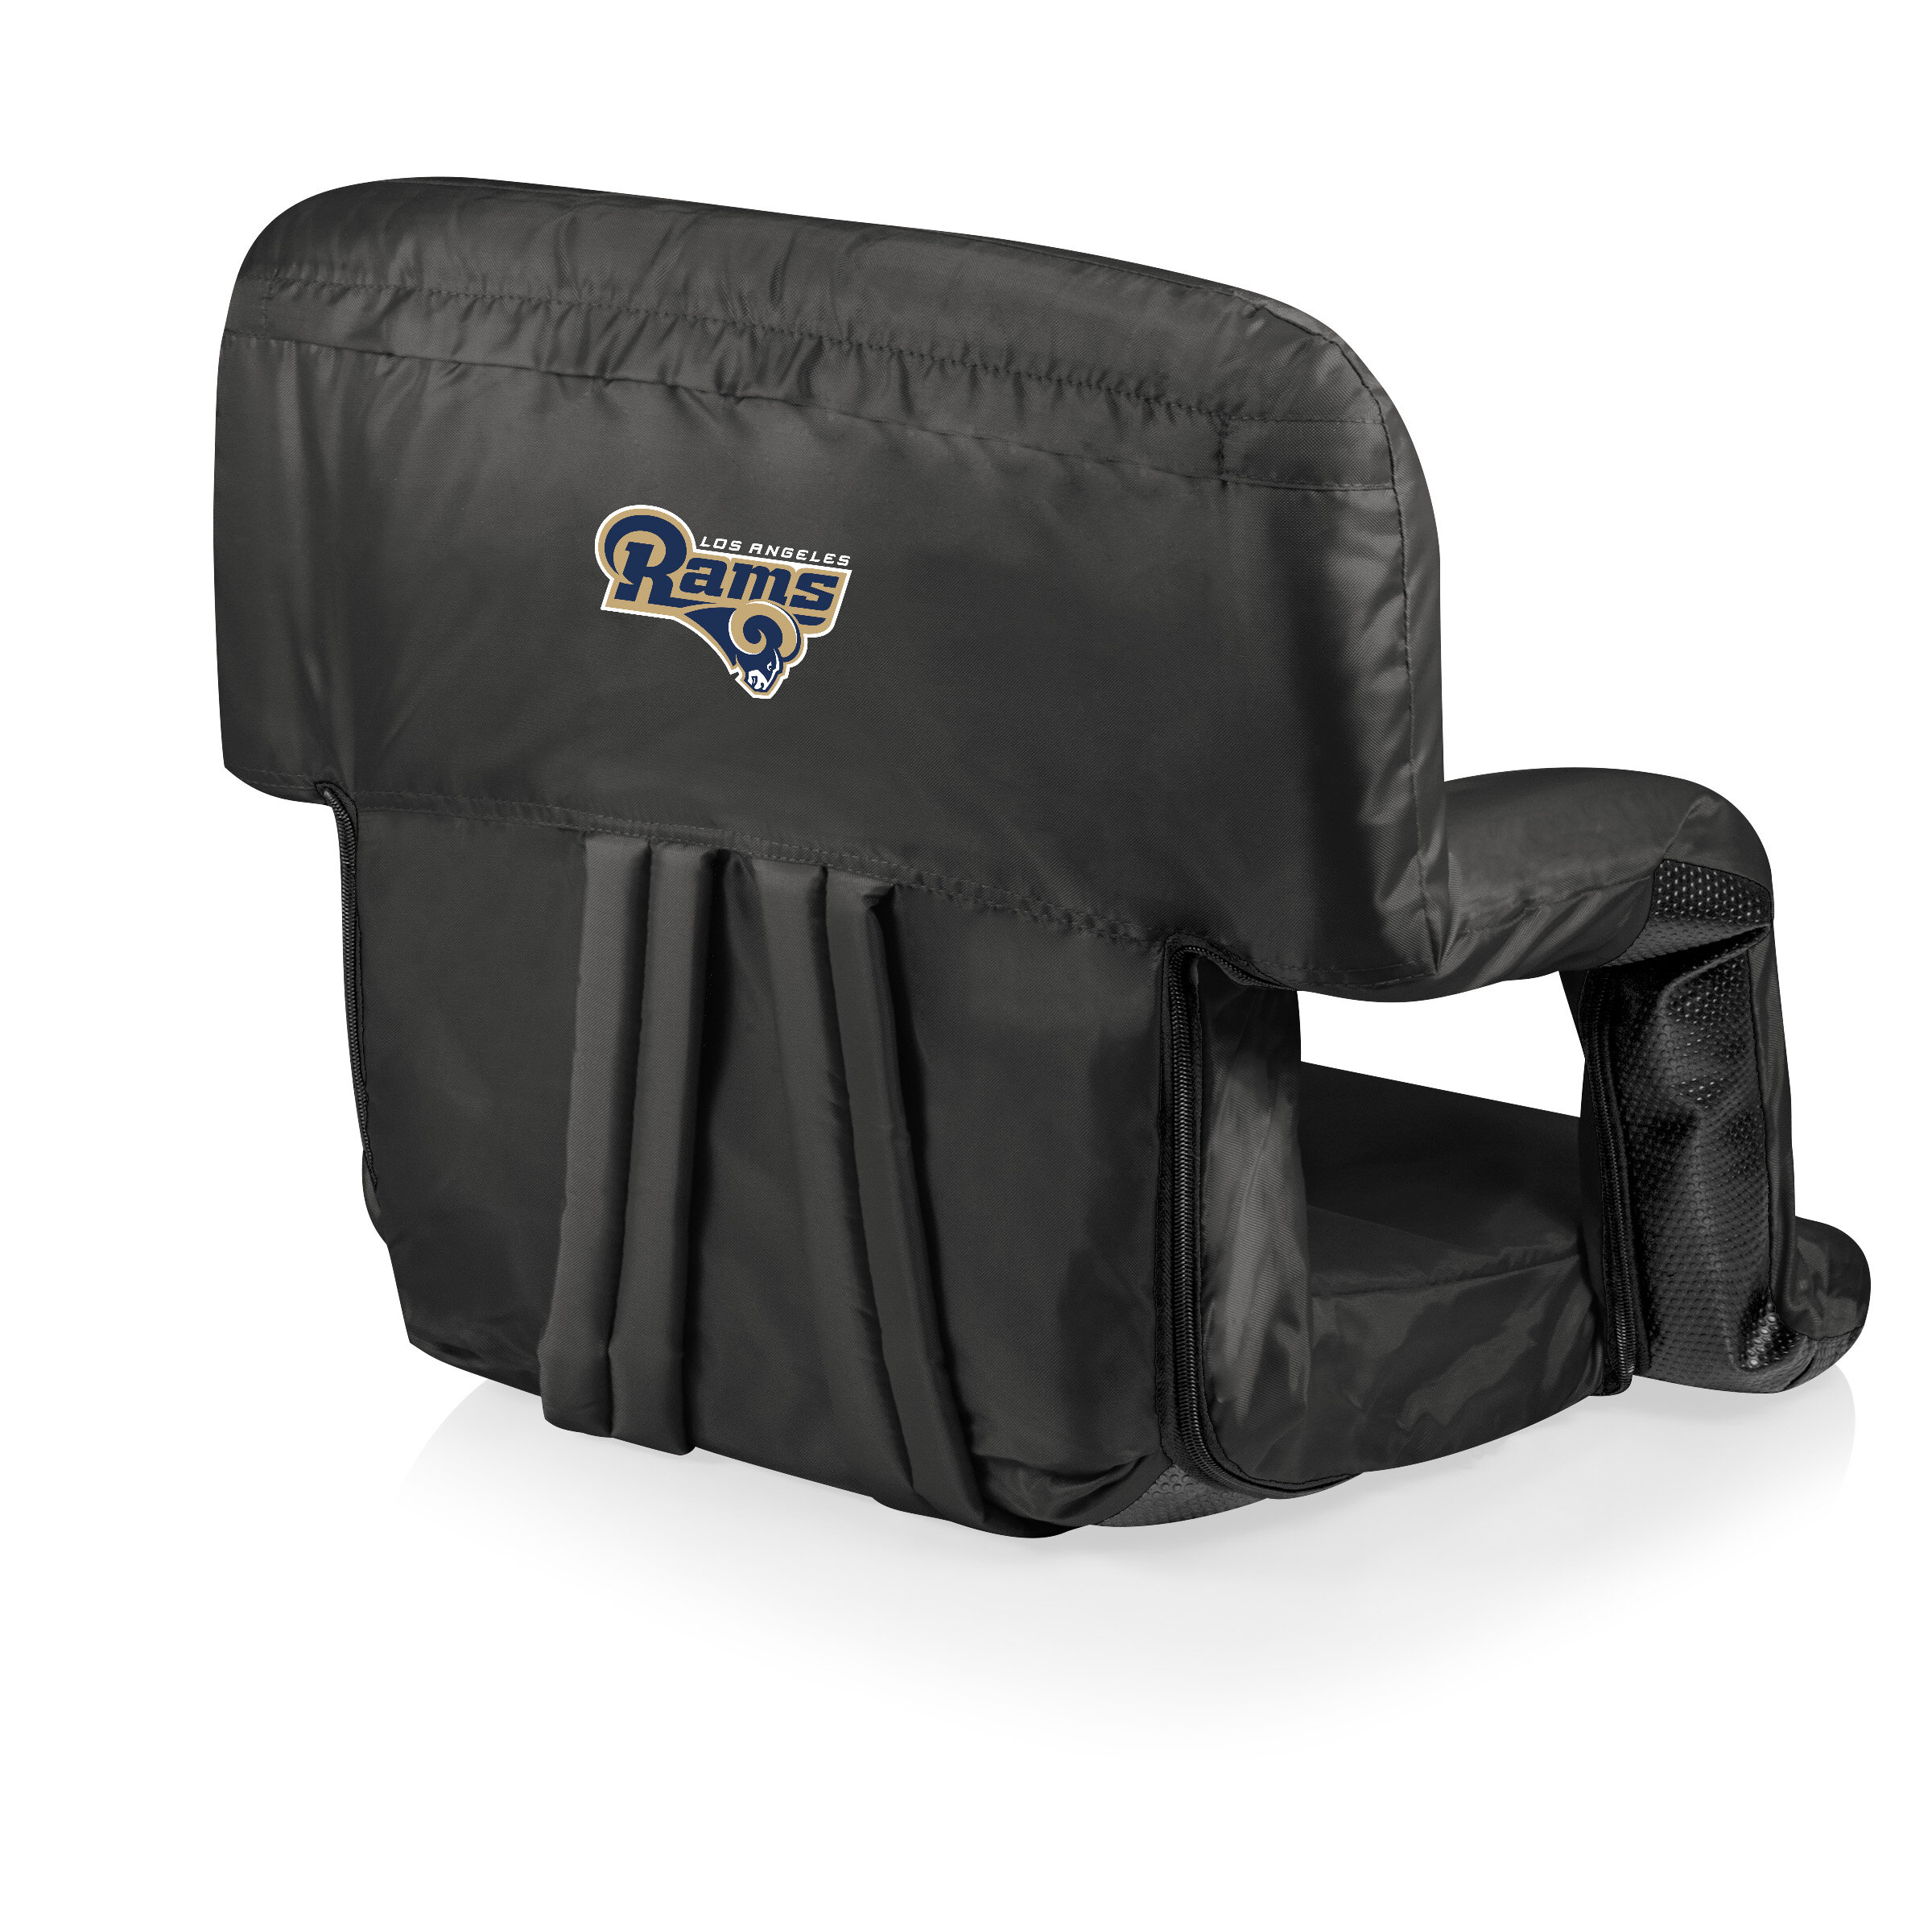 Padded Stadium Chair Portable Seat Folding Football Bleacher Cushion Recliner